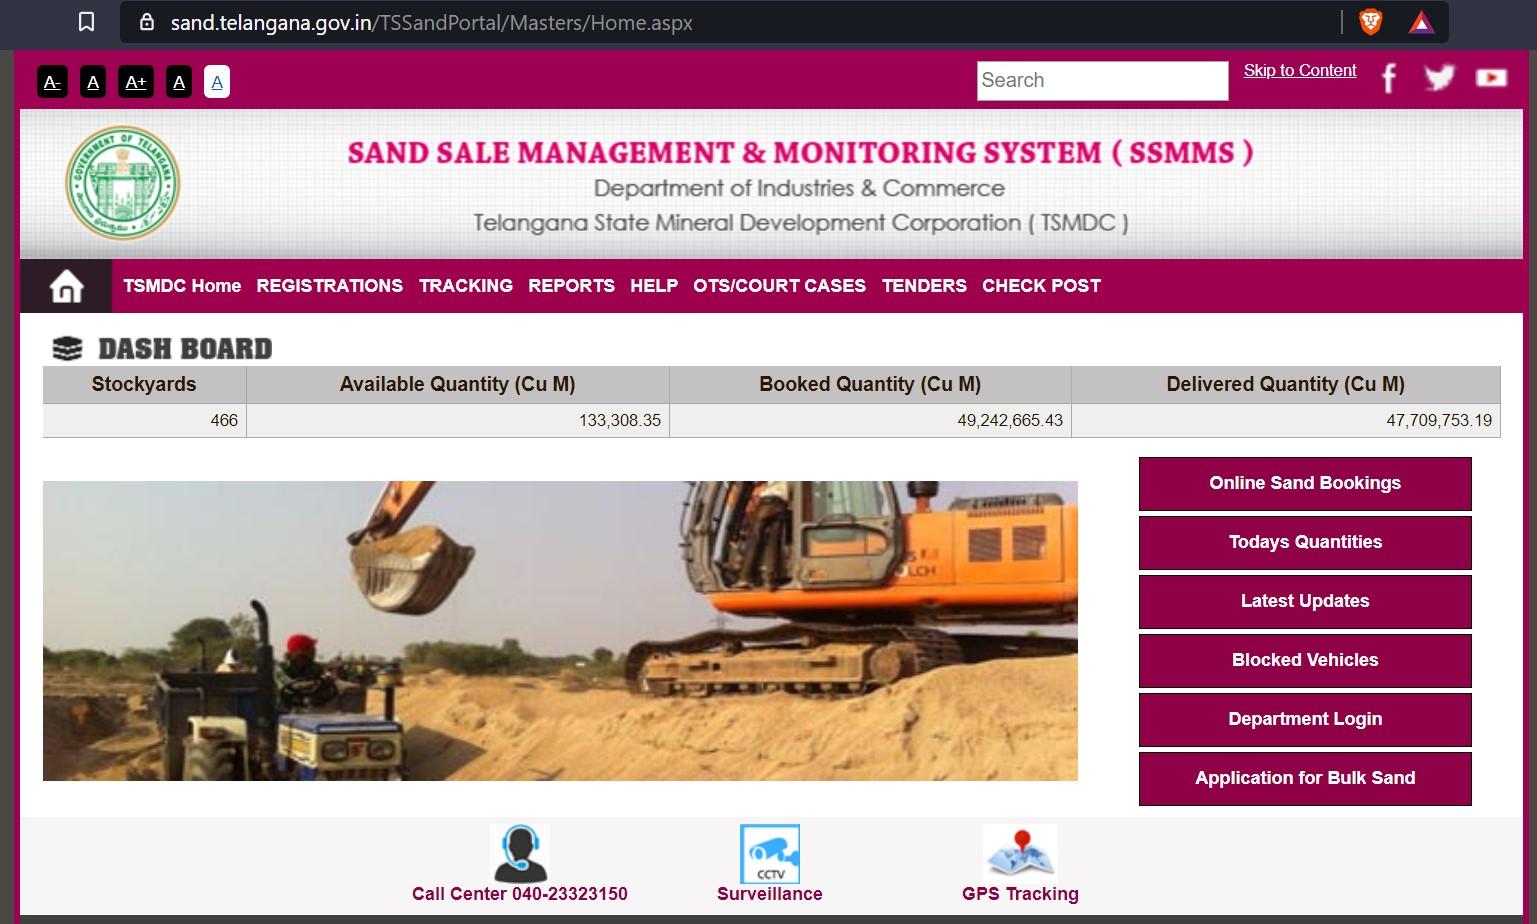 SSMMS Sand Booking Portal